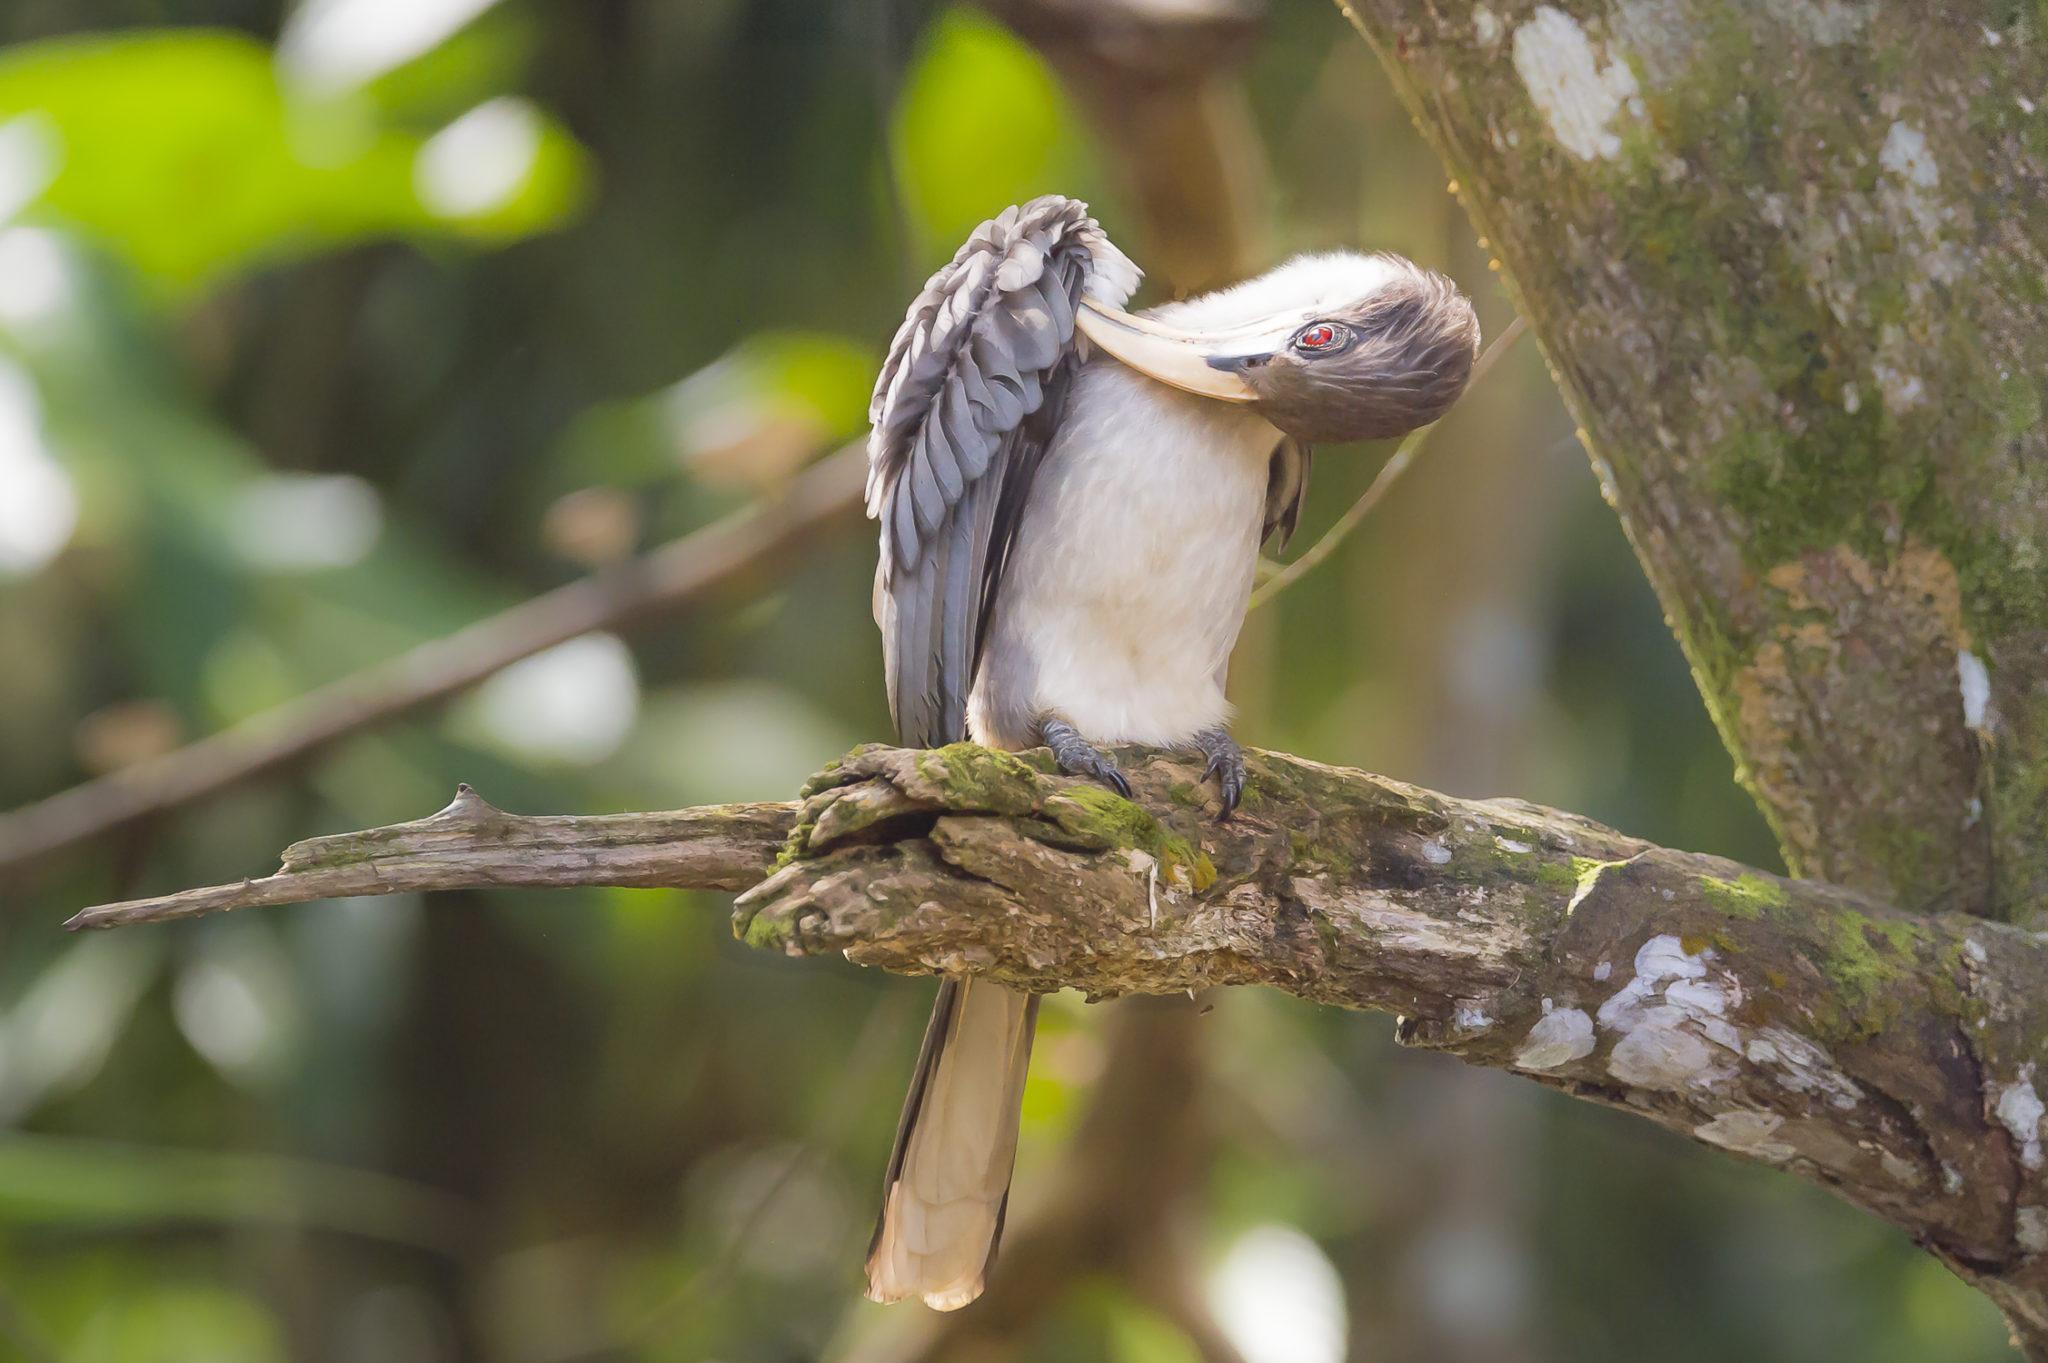 Ceylontoko (Sri Lanka Grey Hornbill, Ocyceros gingalensis), endemische Art